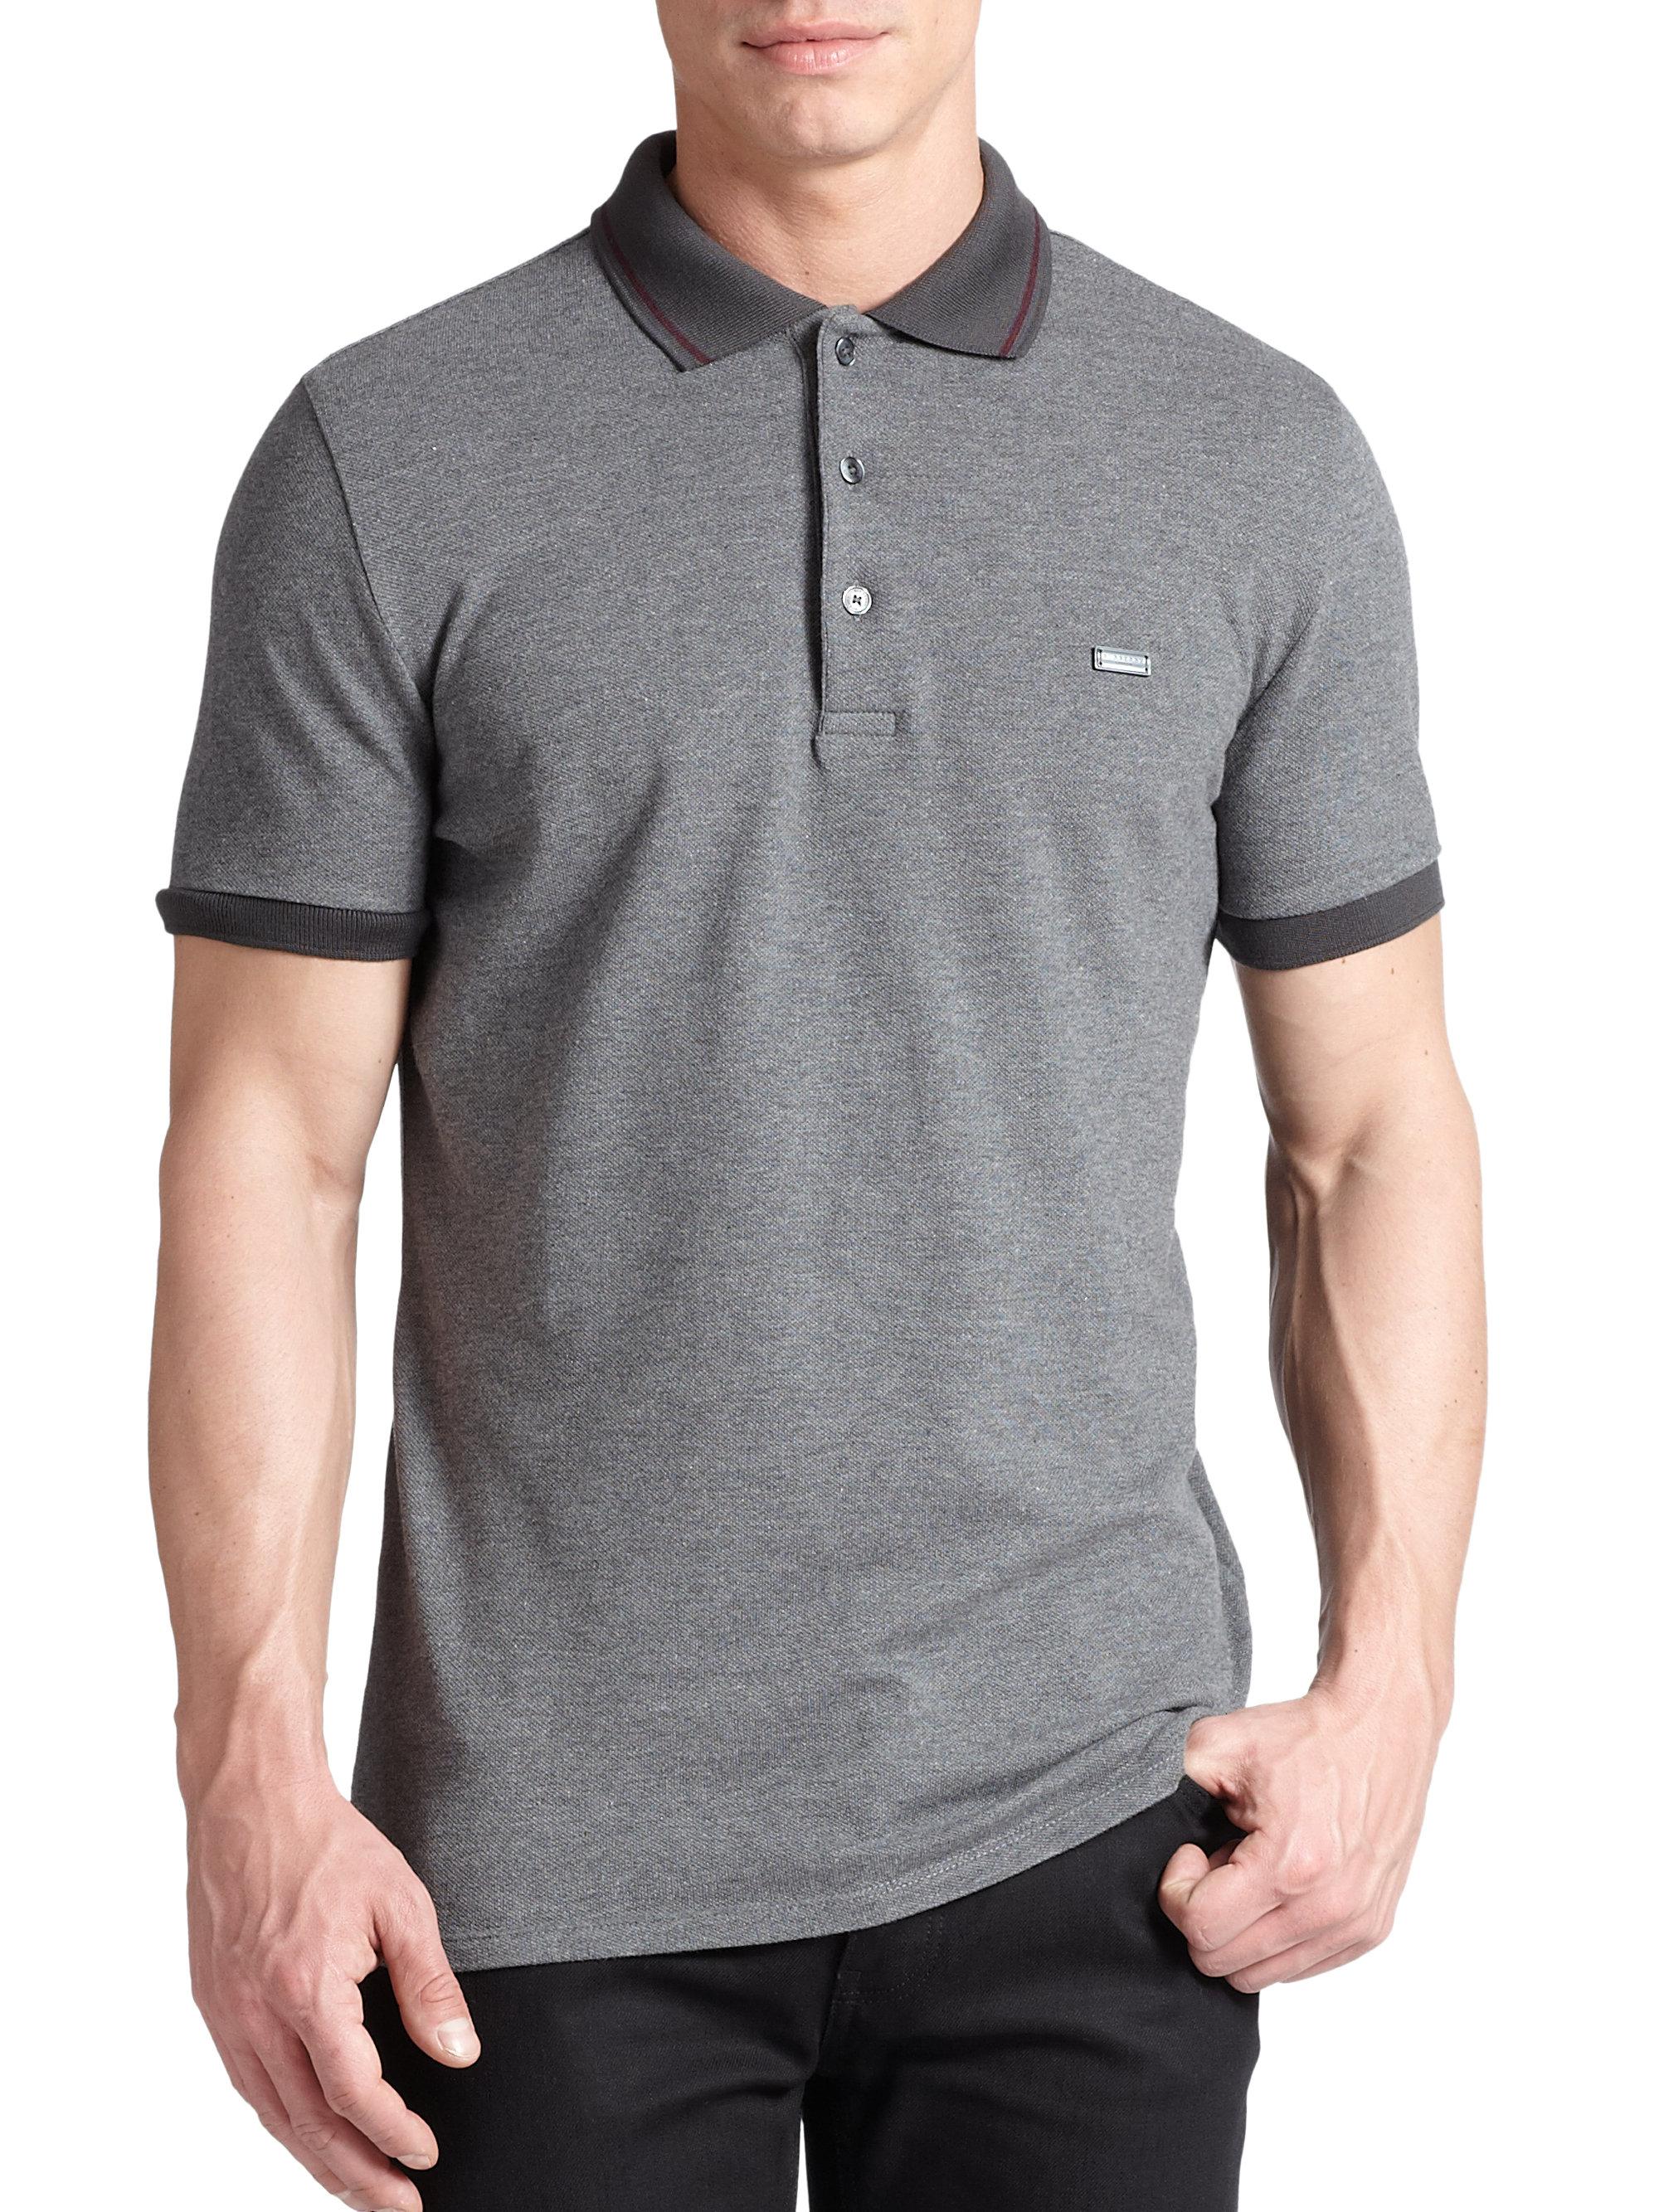 Burberry London Cotton Polo Shirt Grey In Gray For Men